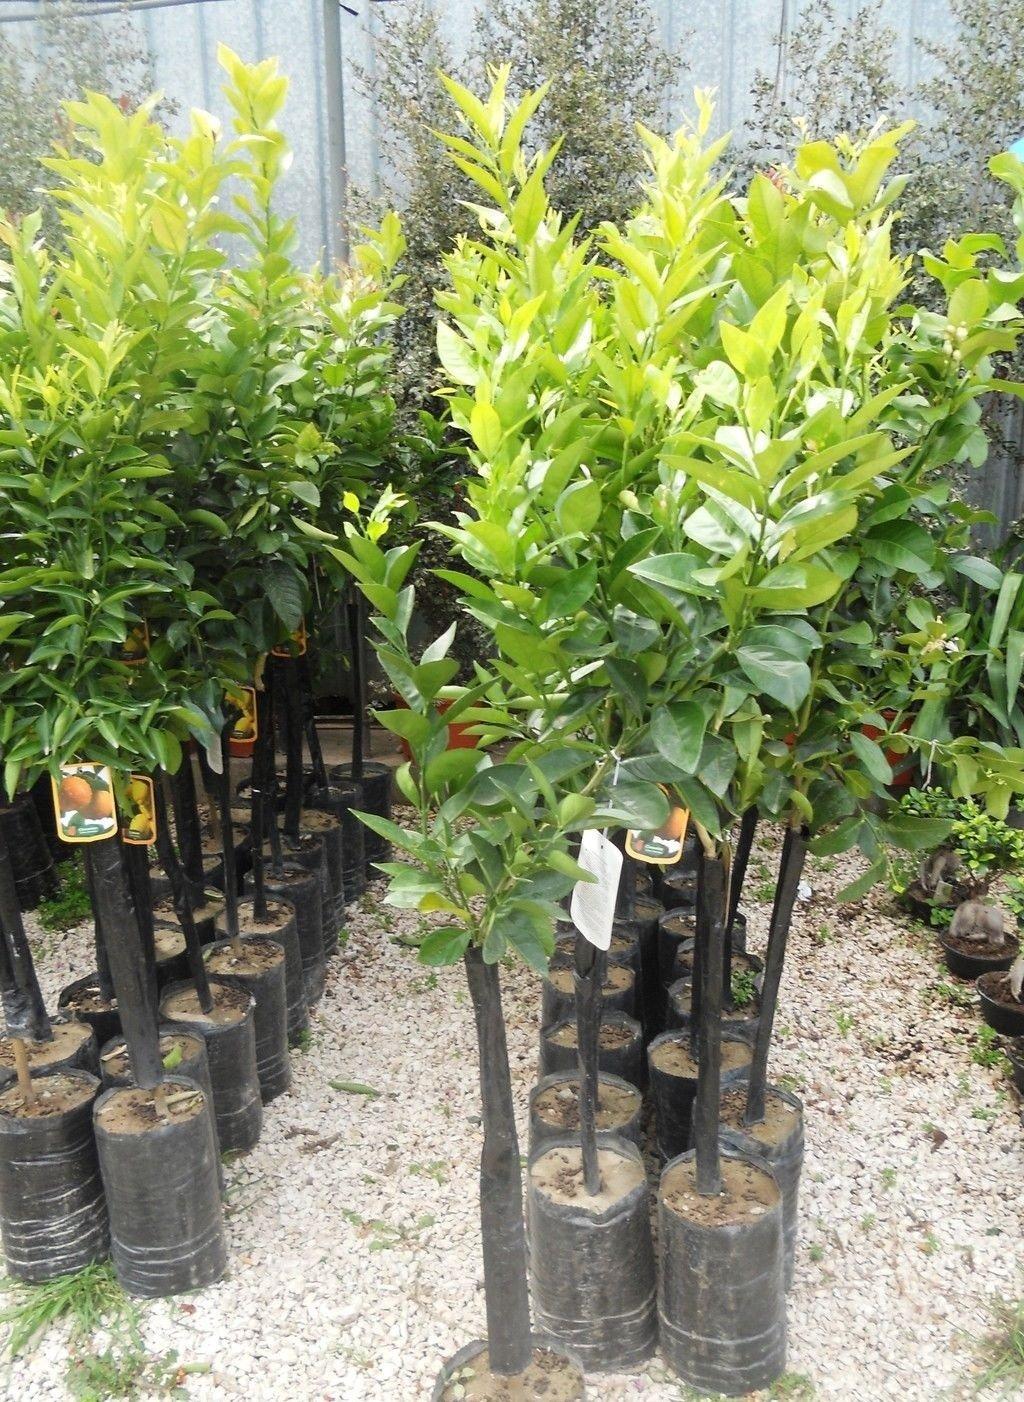 Vendita alberi da giardino on line bel - Vendita alberi da giardino ...